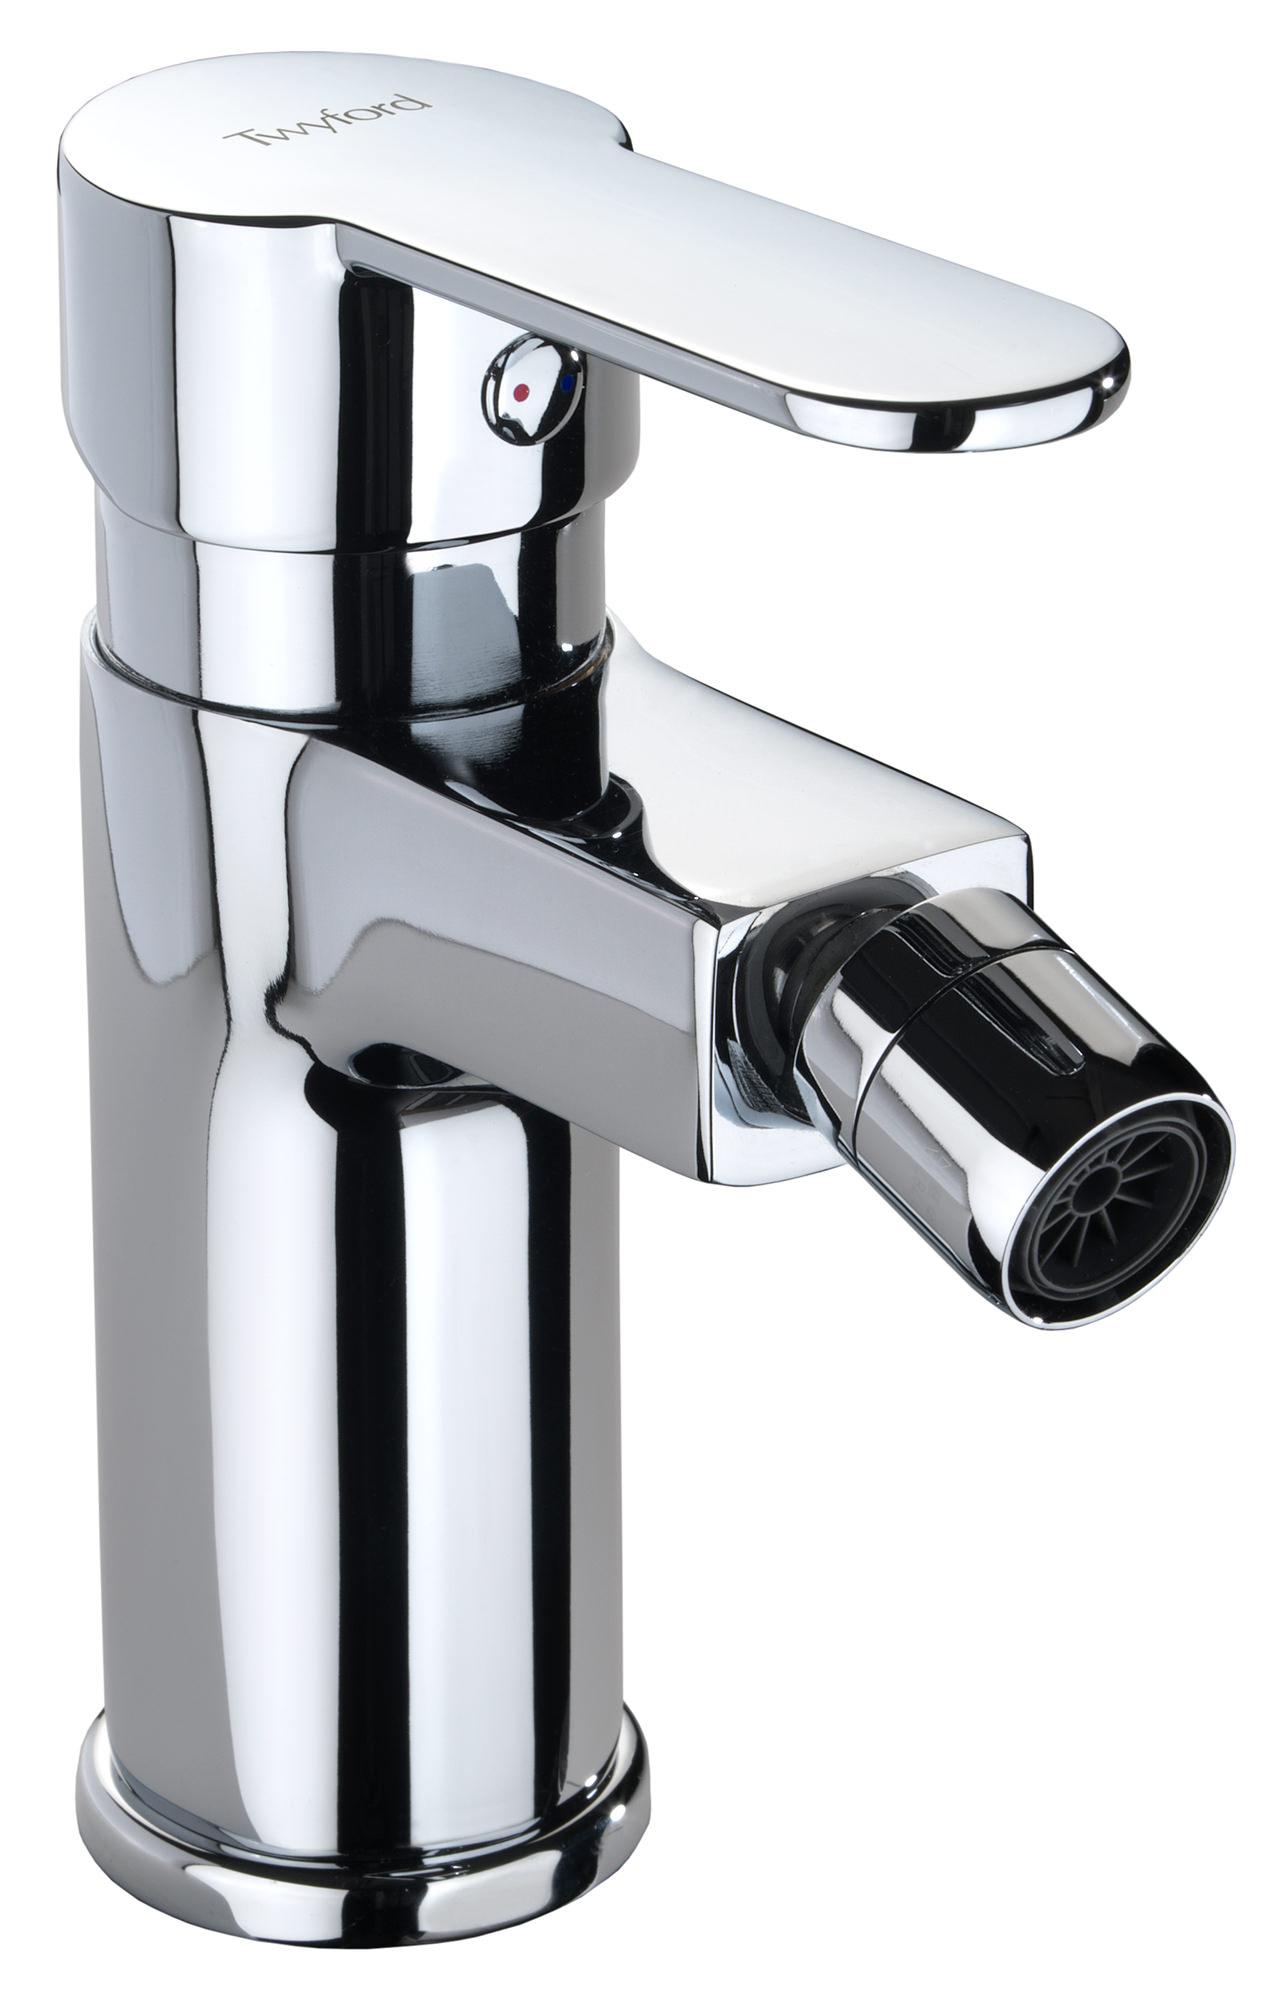 Deck Mounted Bath Shower Mixer Twyford X50 Mono Bidet Mixer Tap With Click Clack Waste